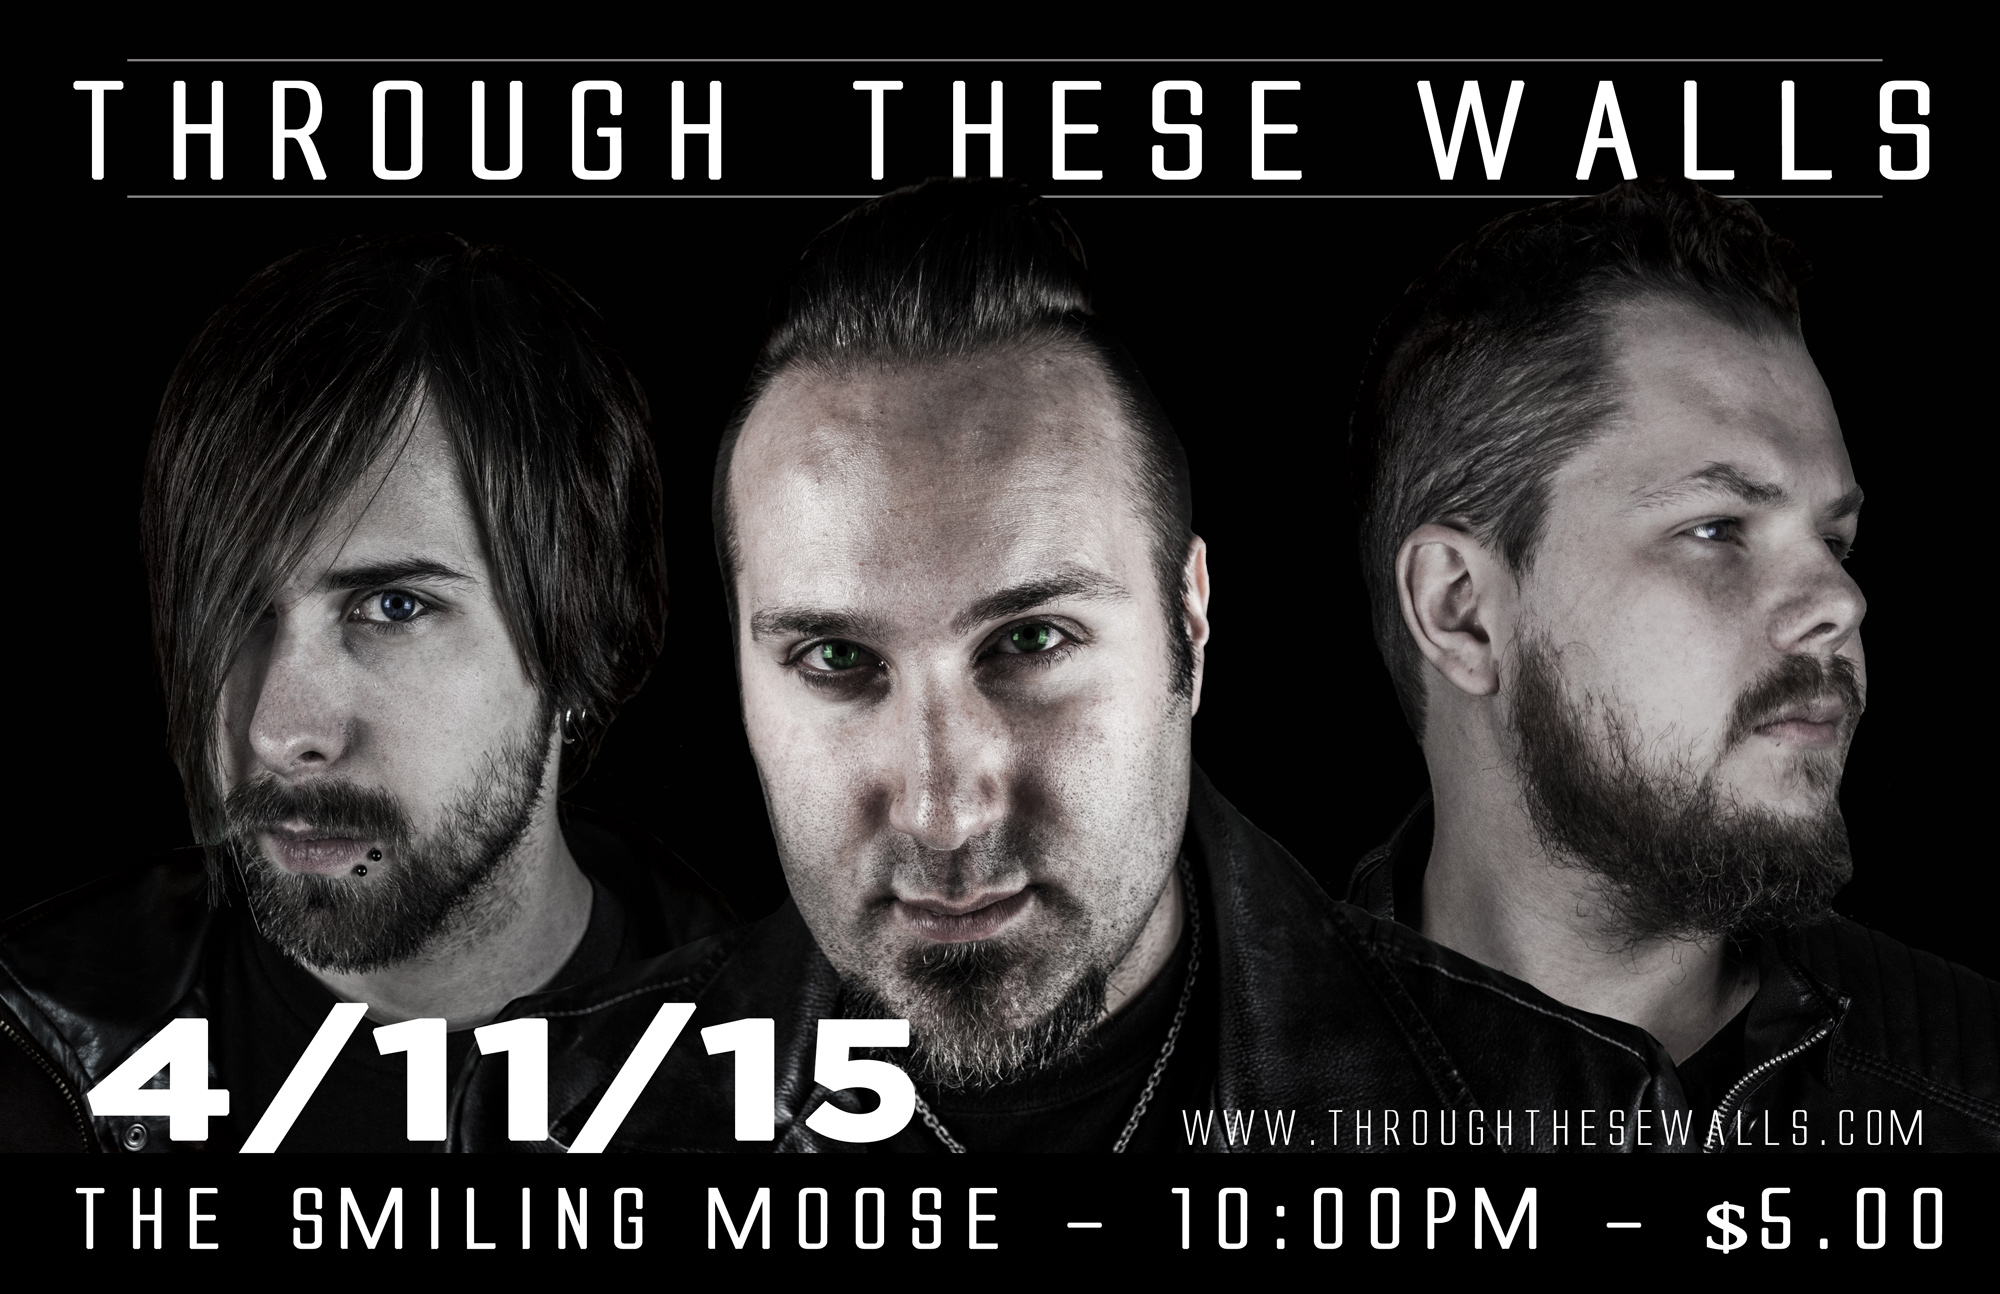 April 11 - Smiling Moose